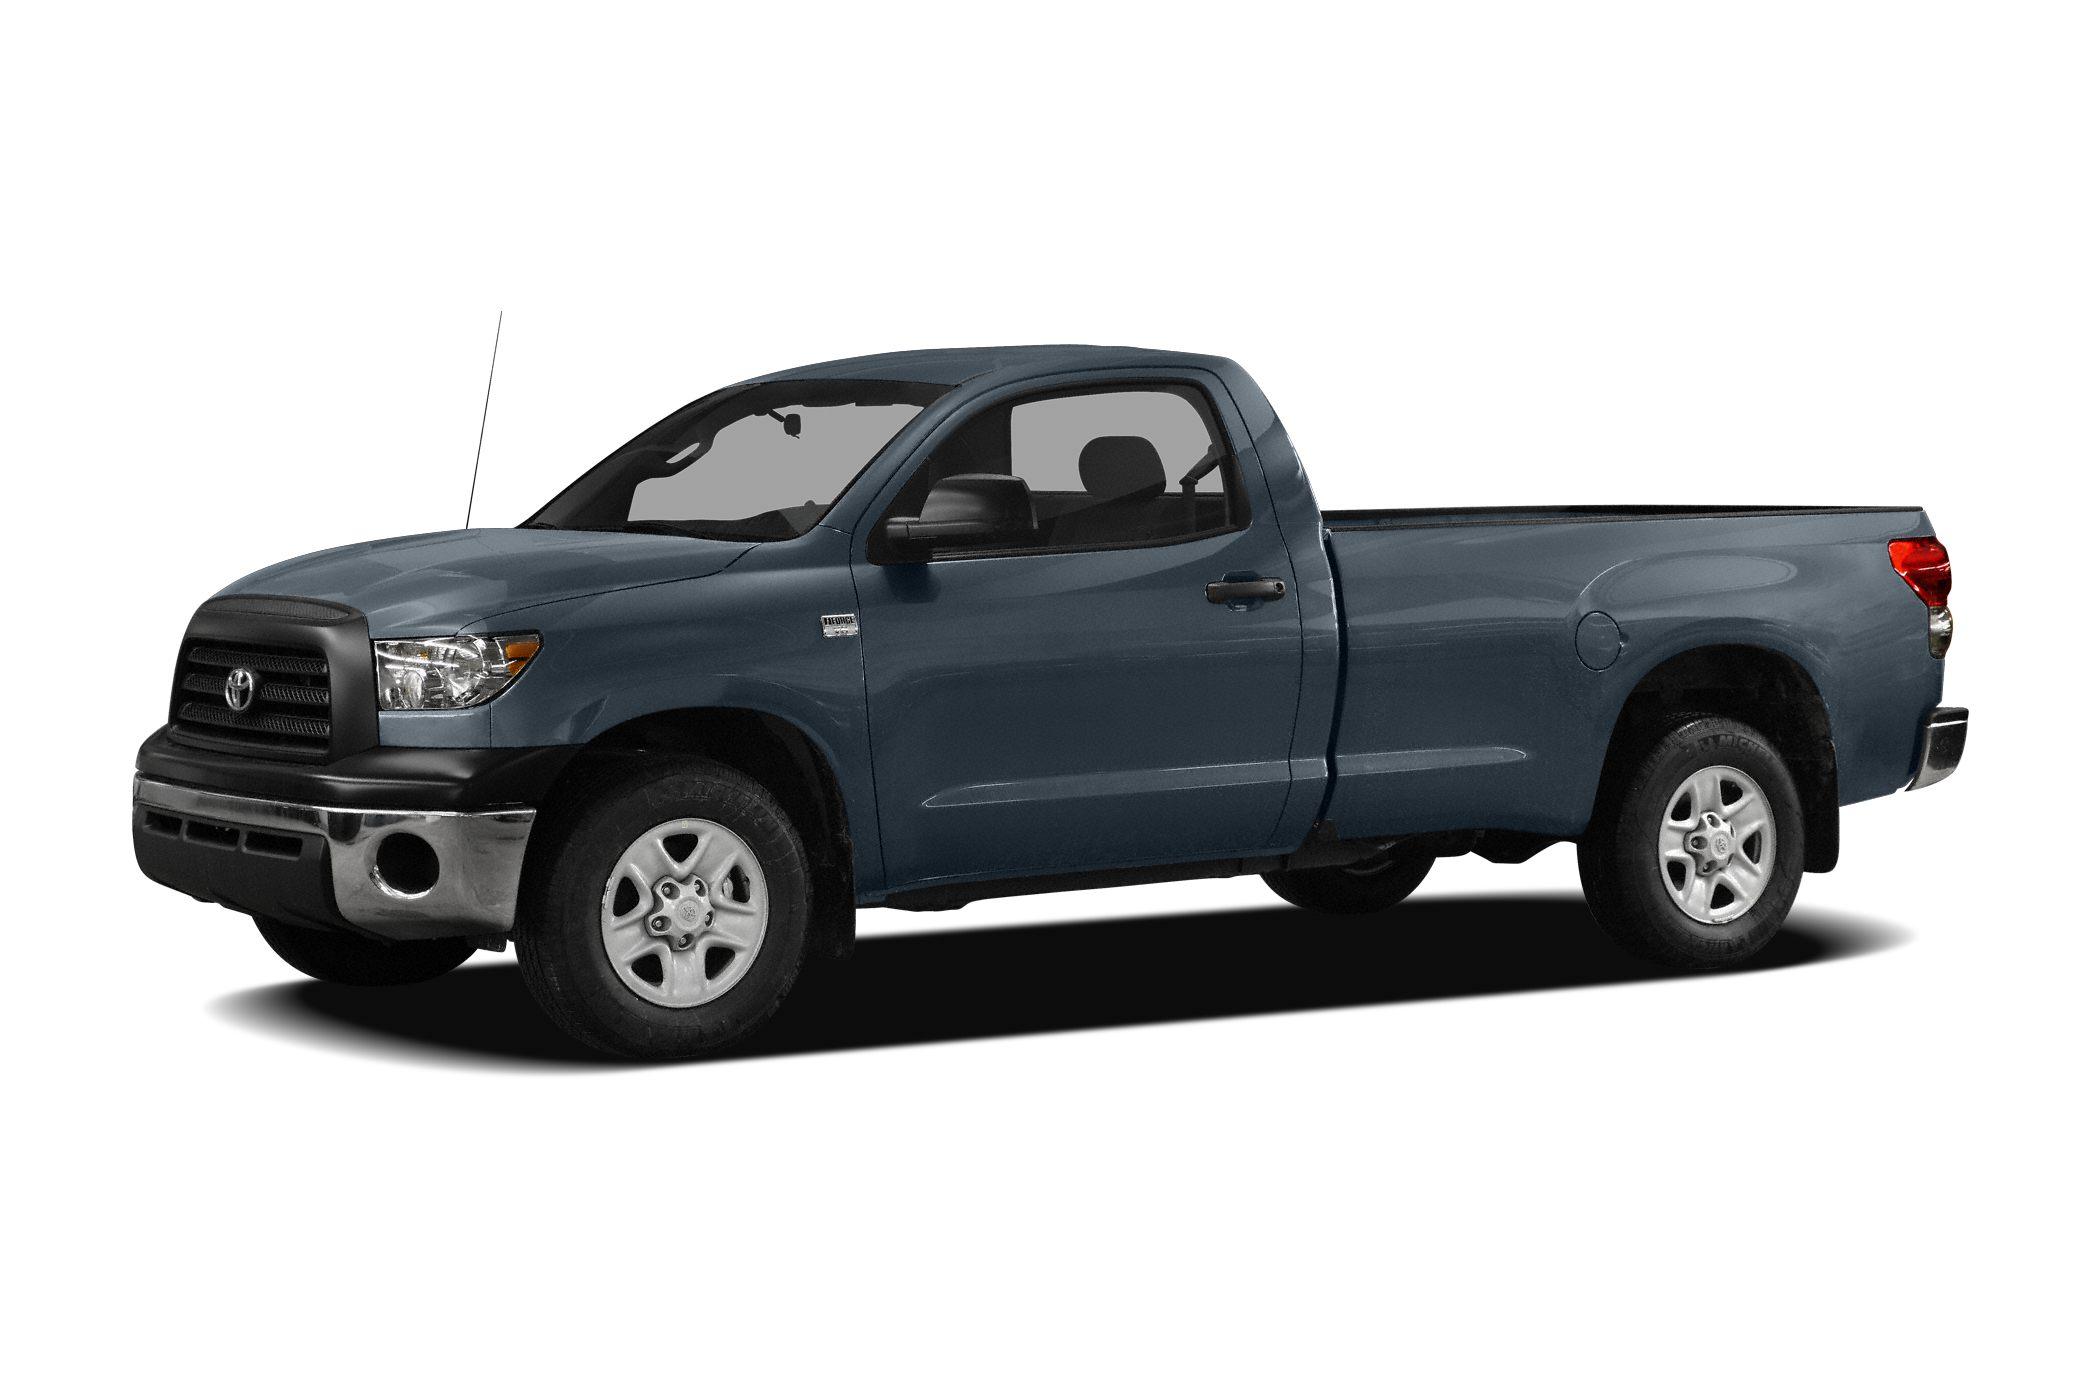 2009 Toyota Tundra Grade Miles 42474Color Gray Stock T22580A VIN 5TFLU52179X019542